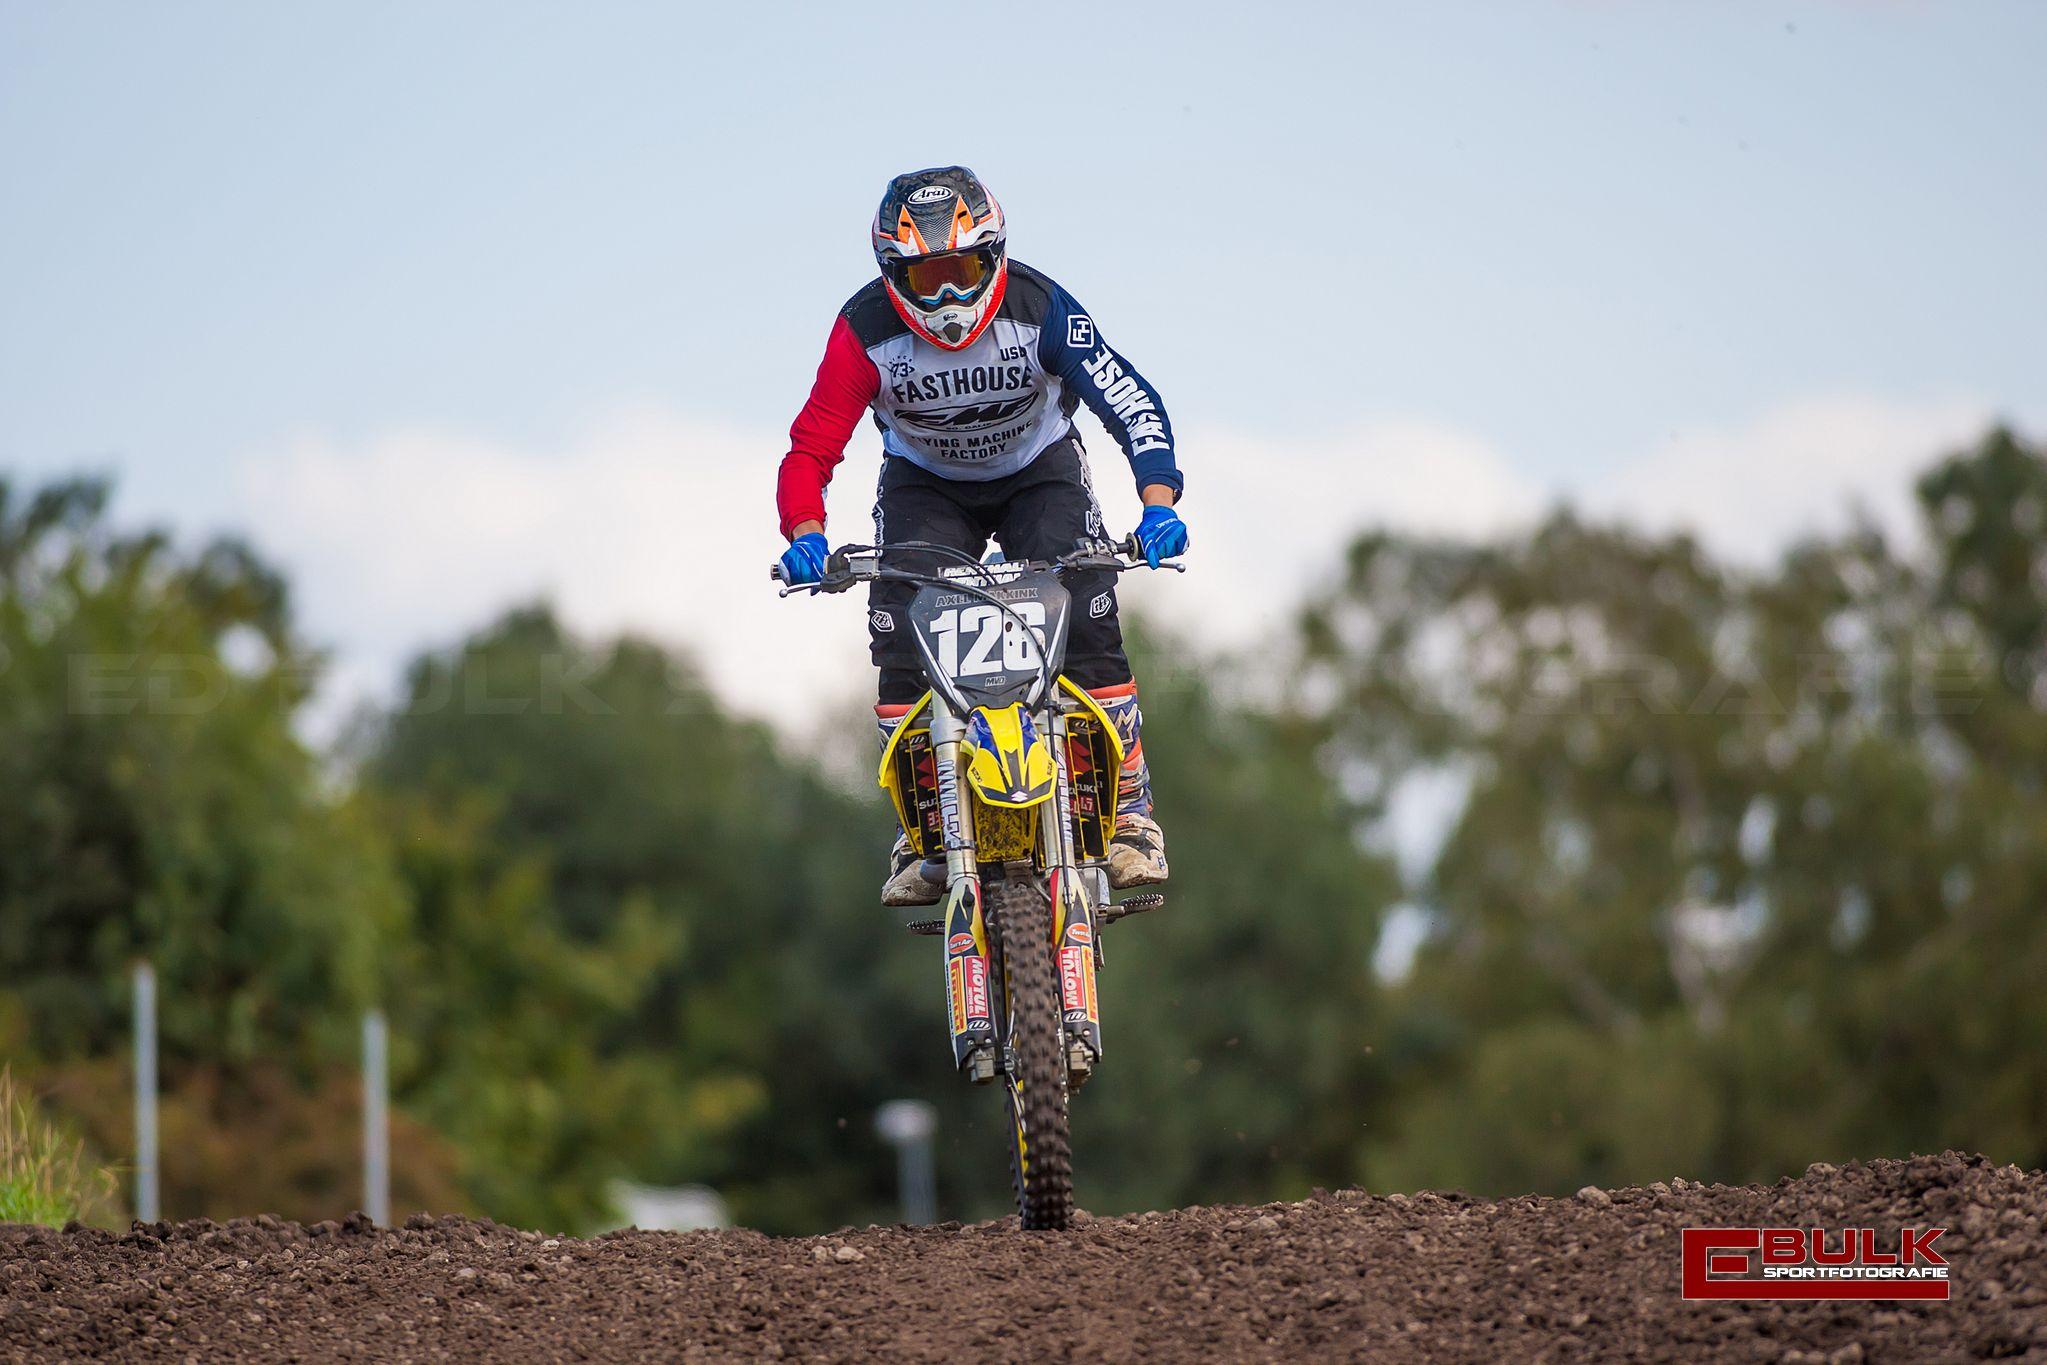 ebs_0206-ed_bulk_sportfotografie